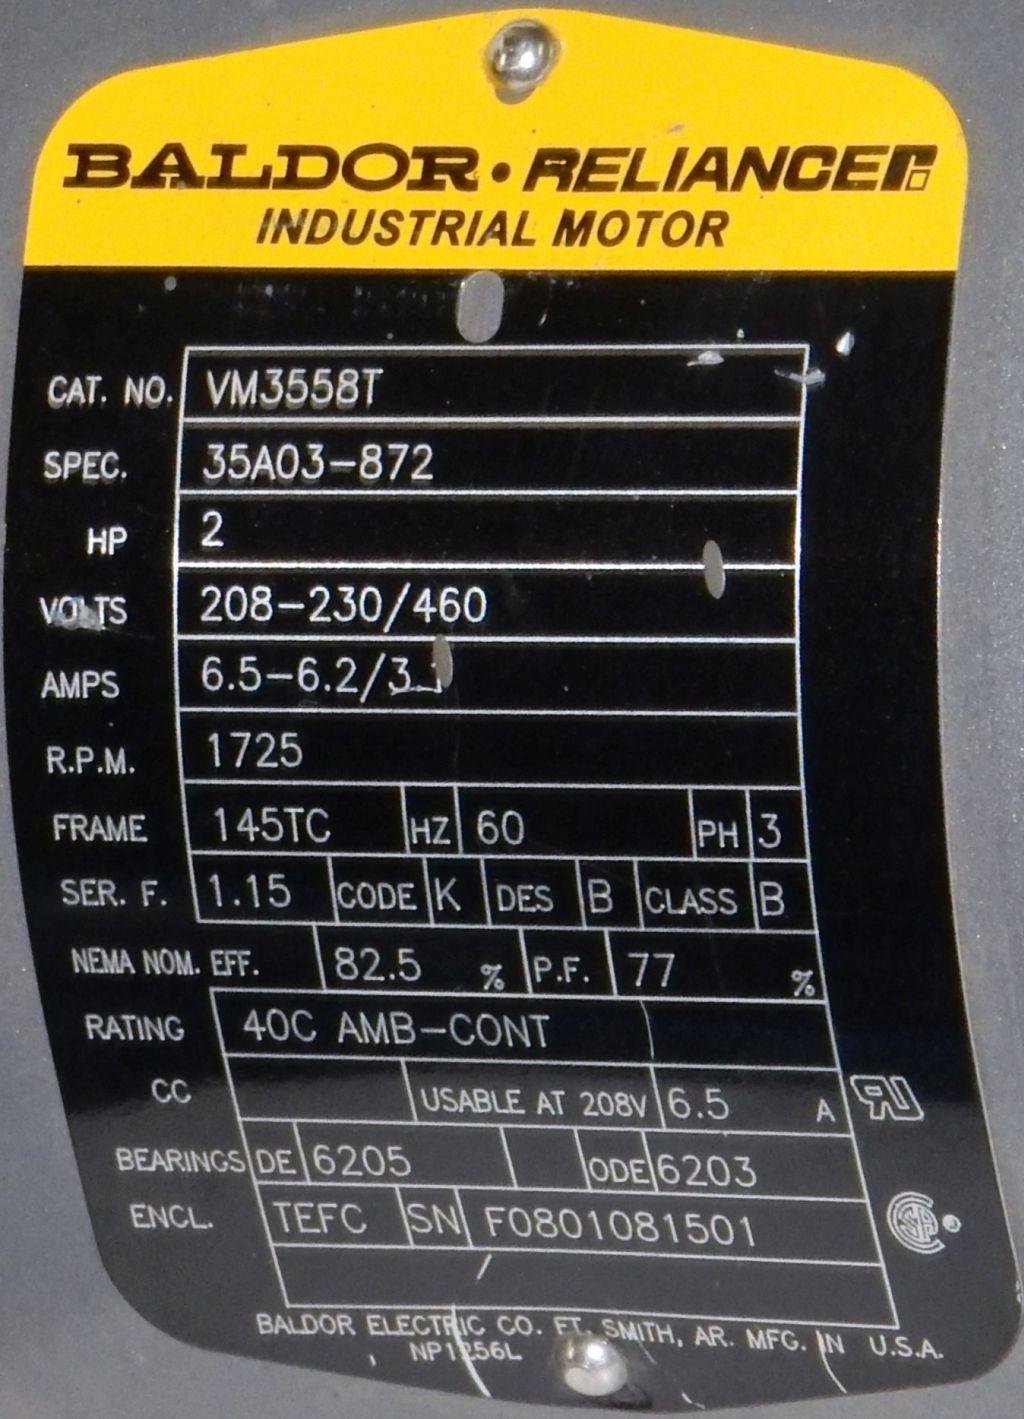 Baldor Industrial Motor Wiring Diagram Free Image Wiring Diagram